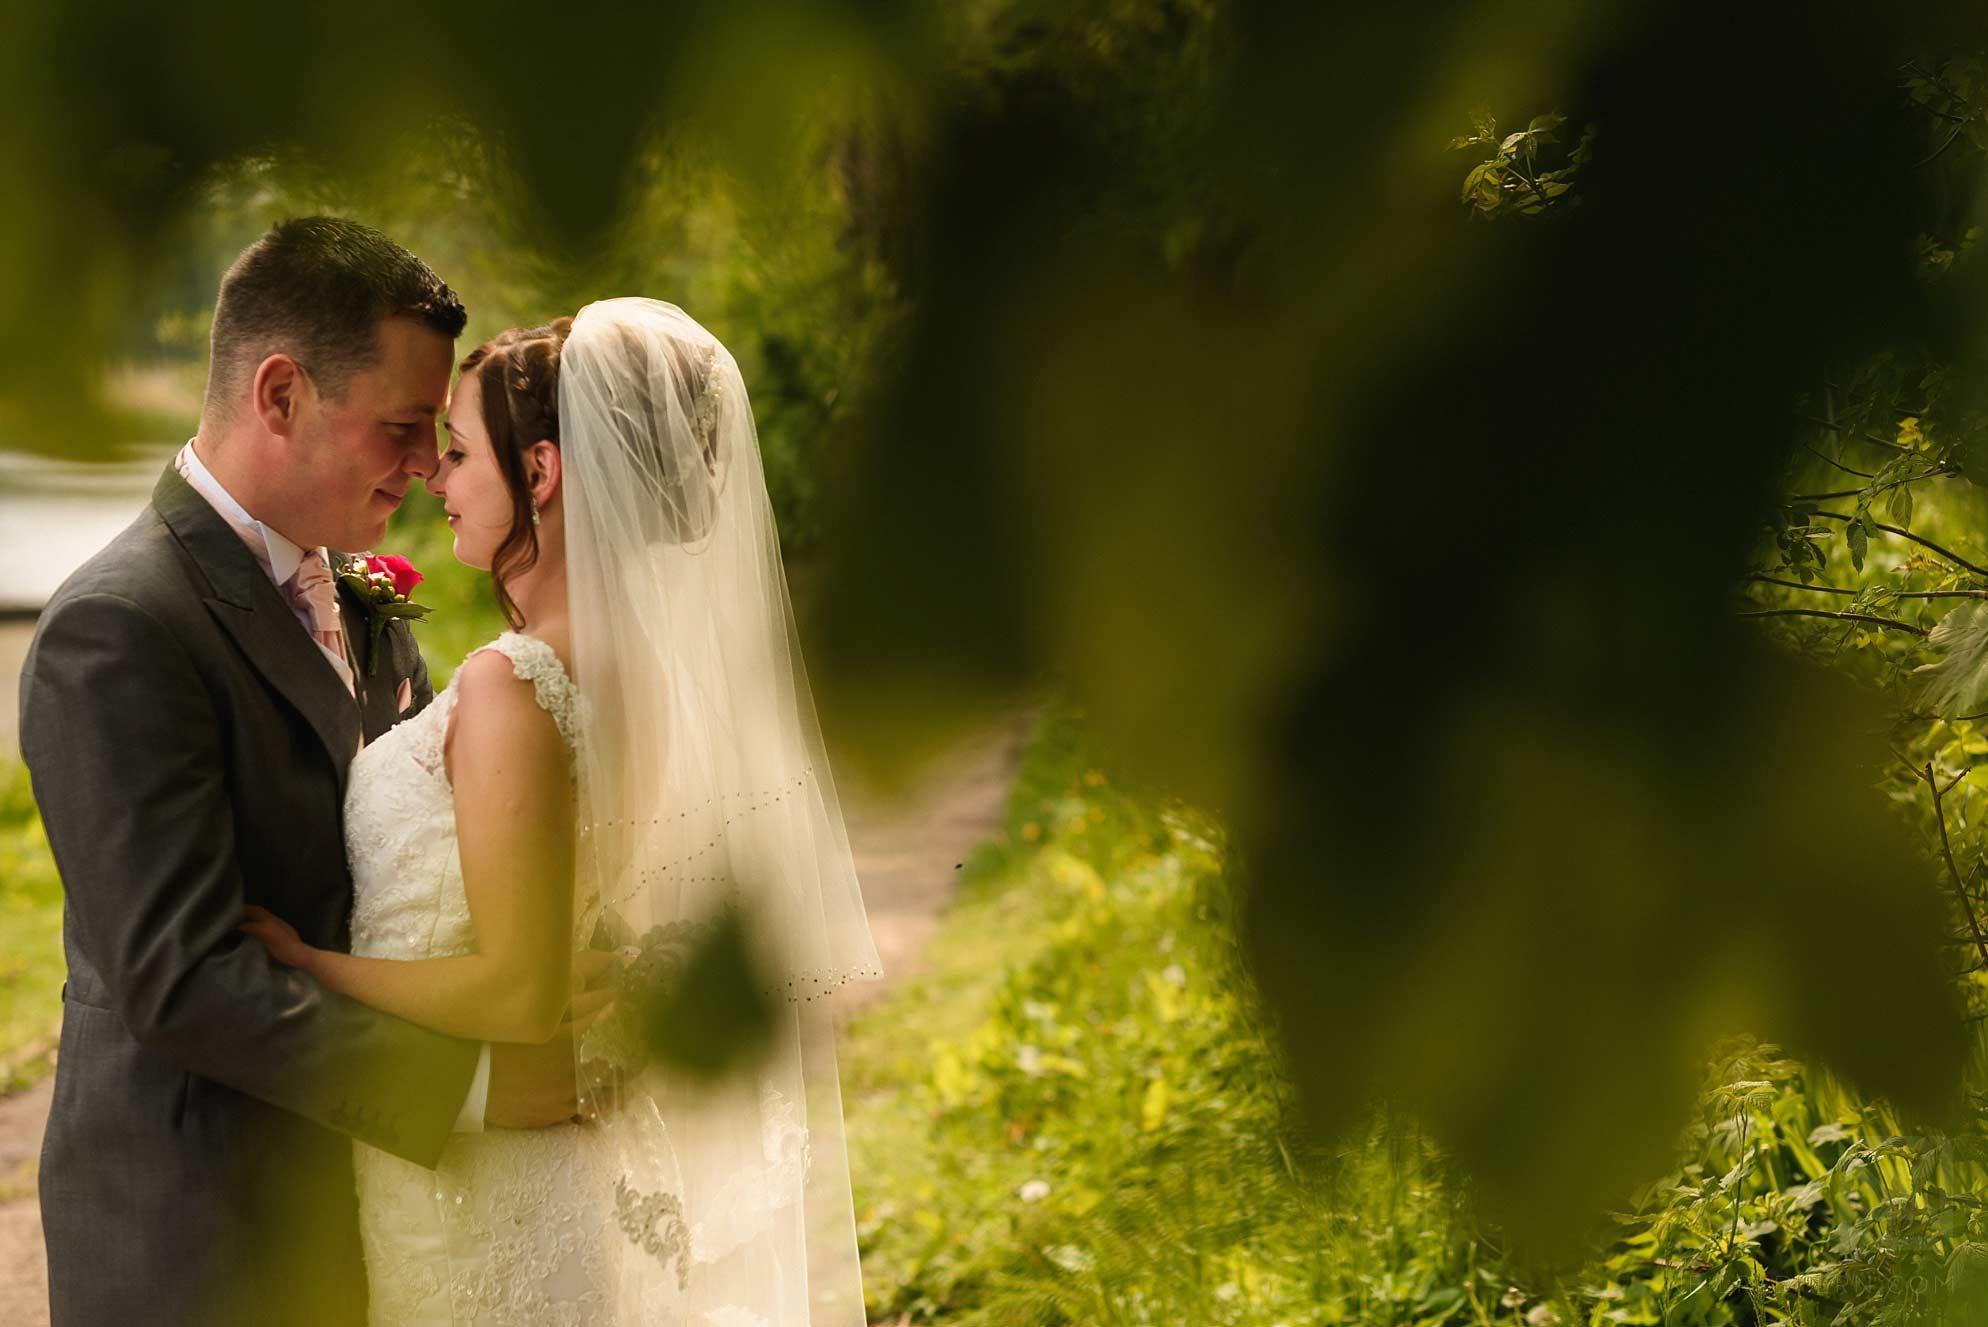 Metropole-Hotel-Llandrindod-Wells-wedding-23